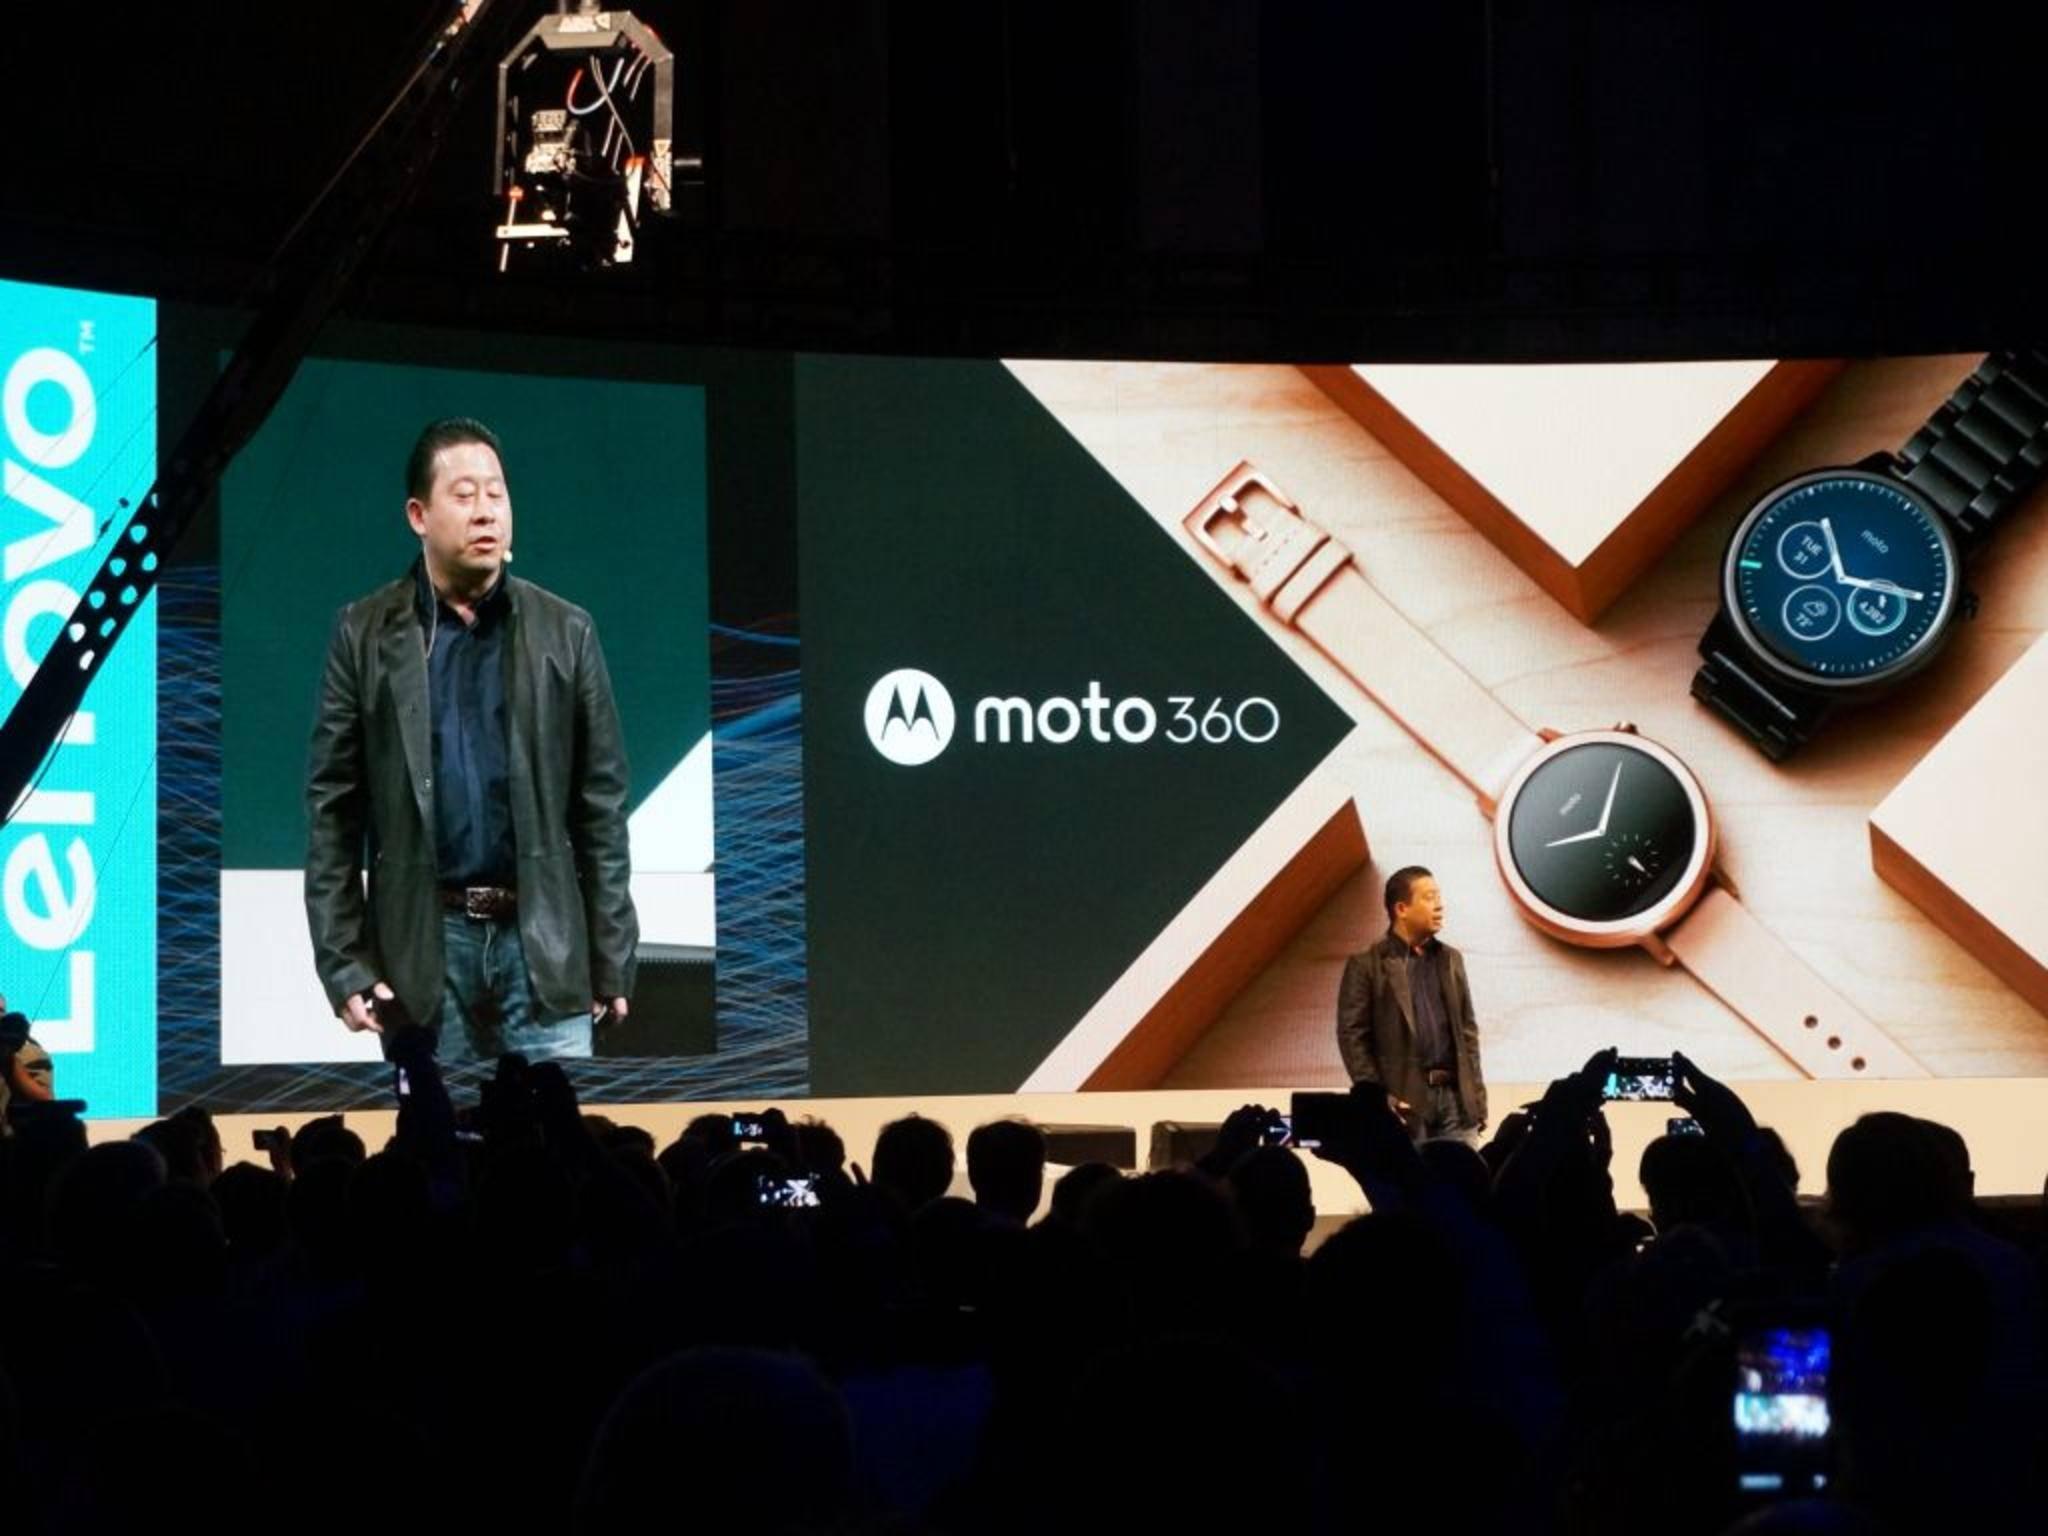 Moto 360 3